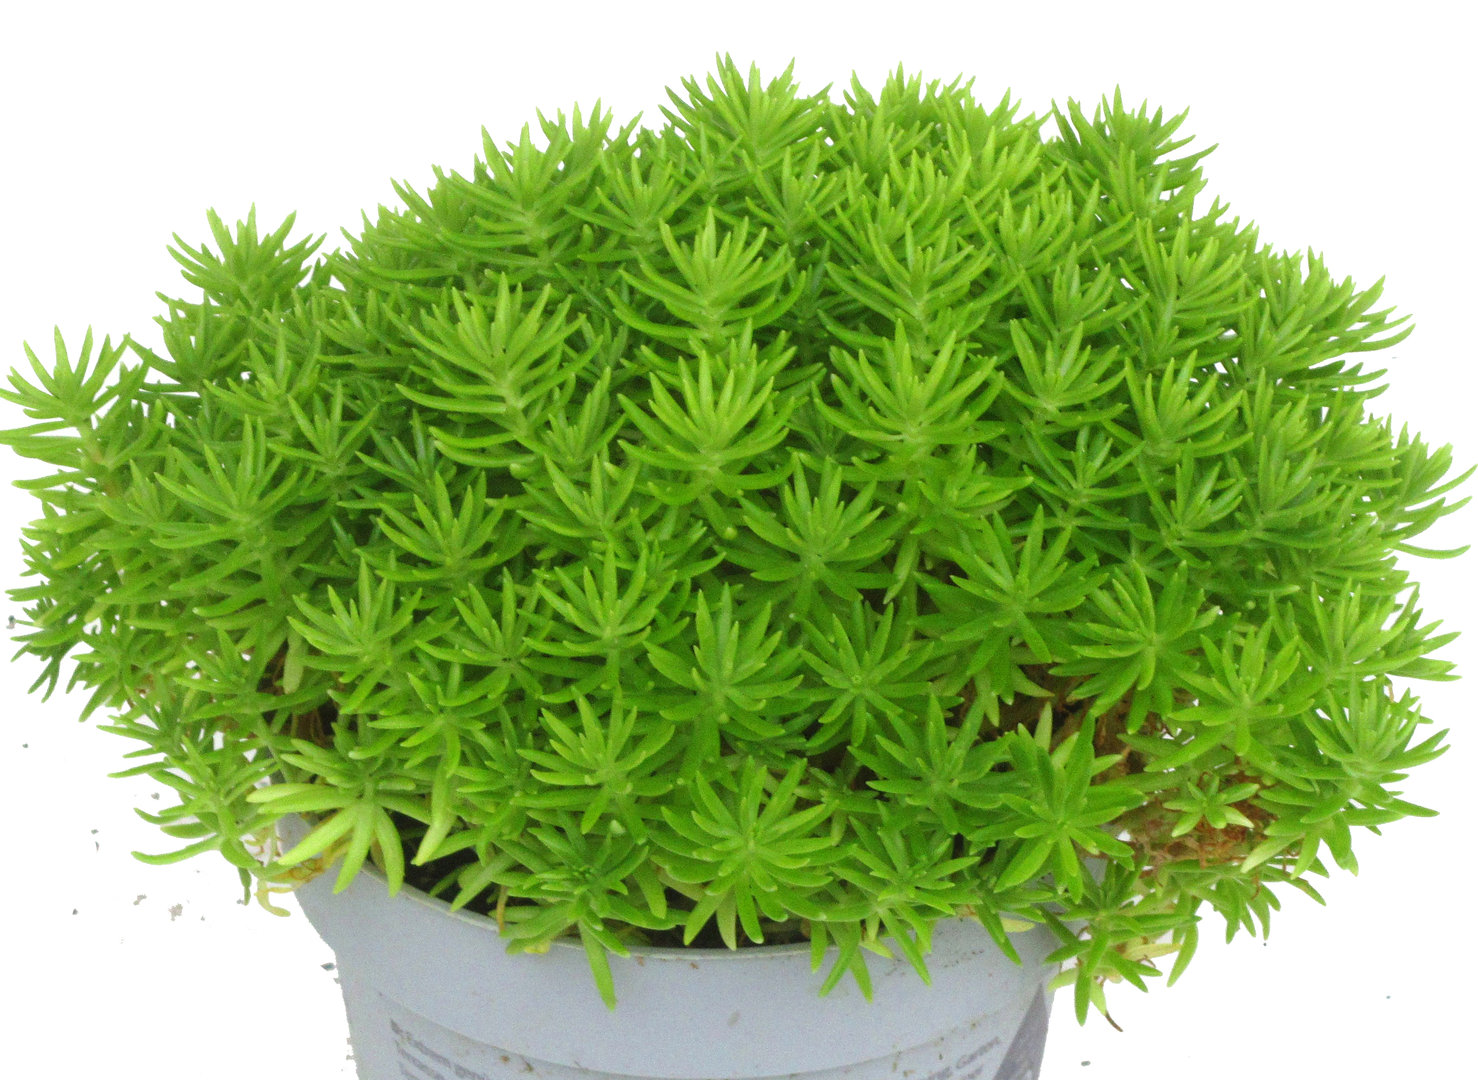 sedum anopetalum lemon ball tripmadame pflanzen versand f r die besten winterharten. Black Bedroom Furniture Sets. Home Design Ideas